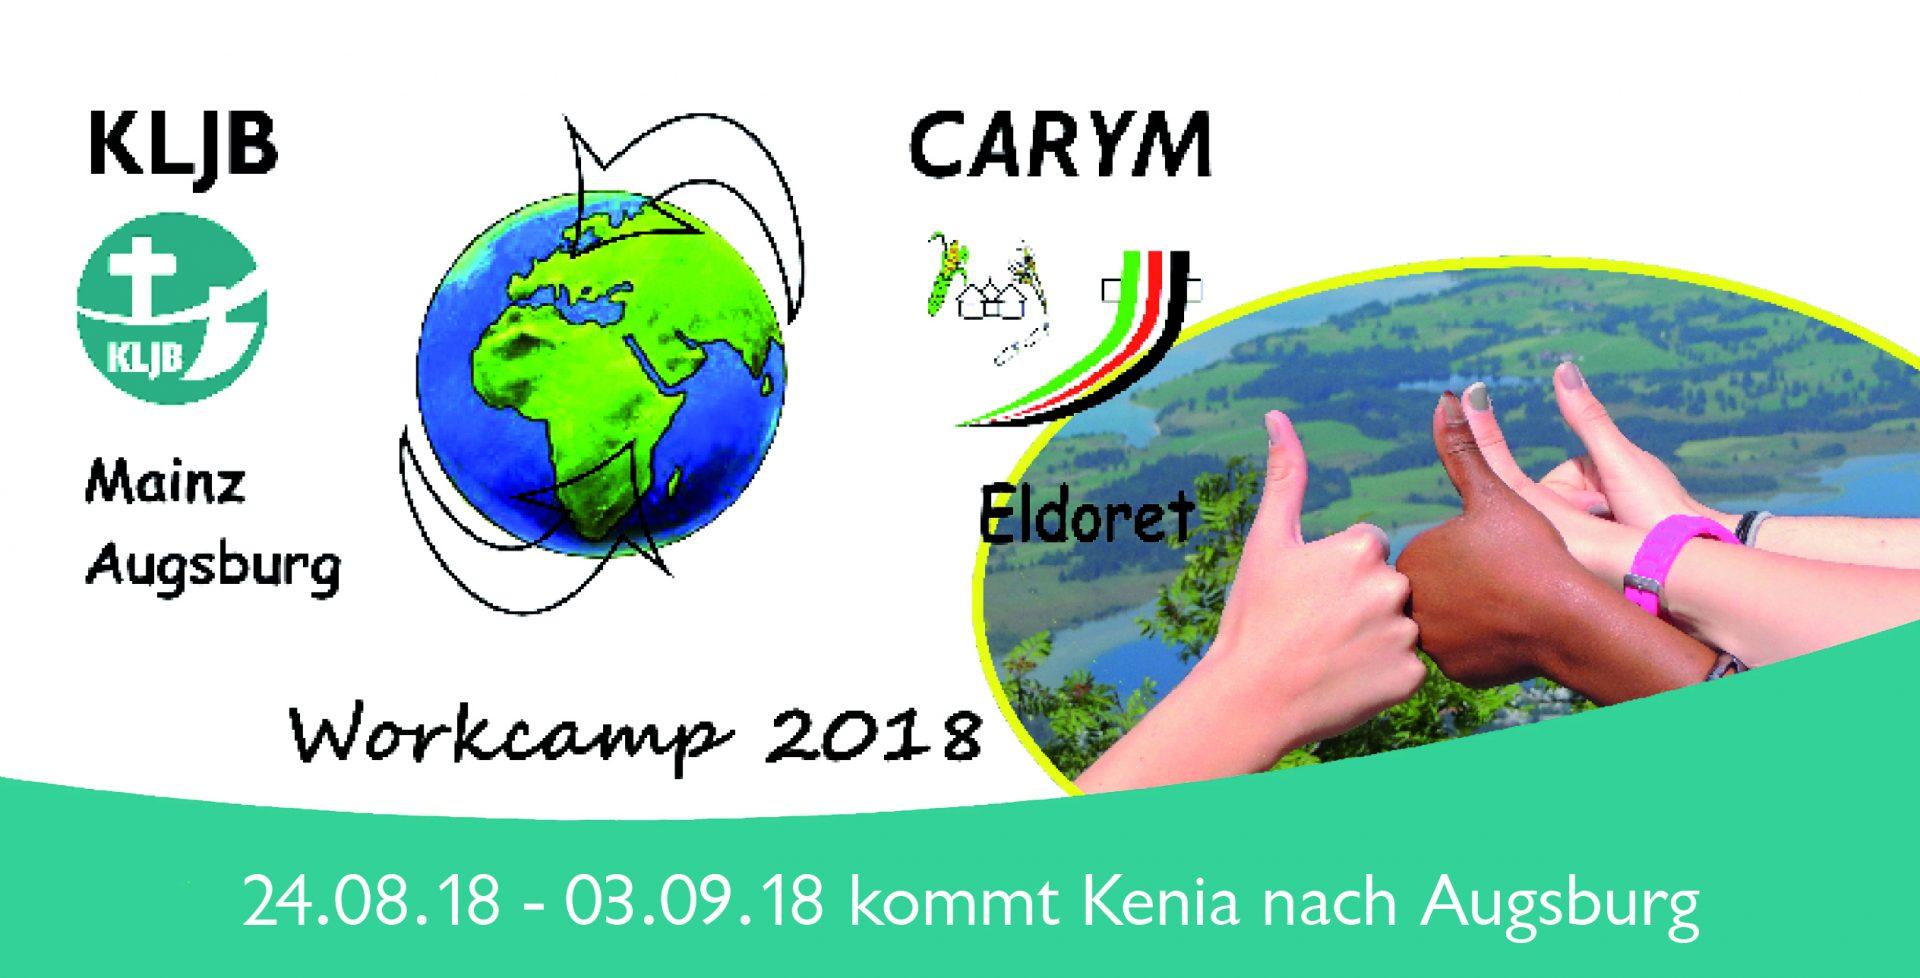 Kenia Workcamp 2018